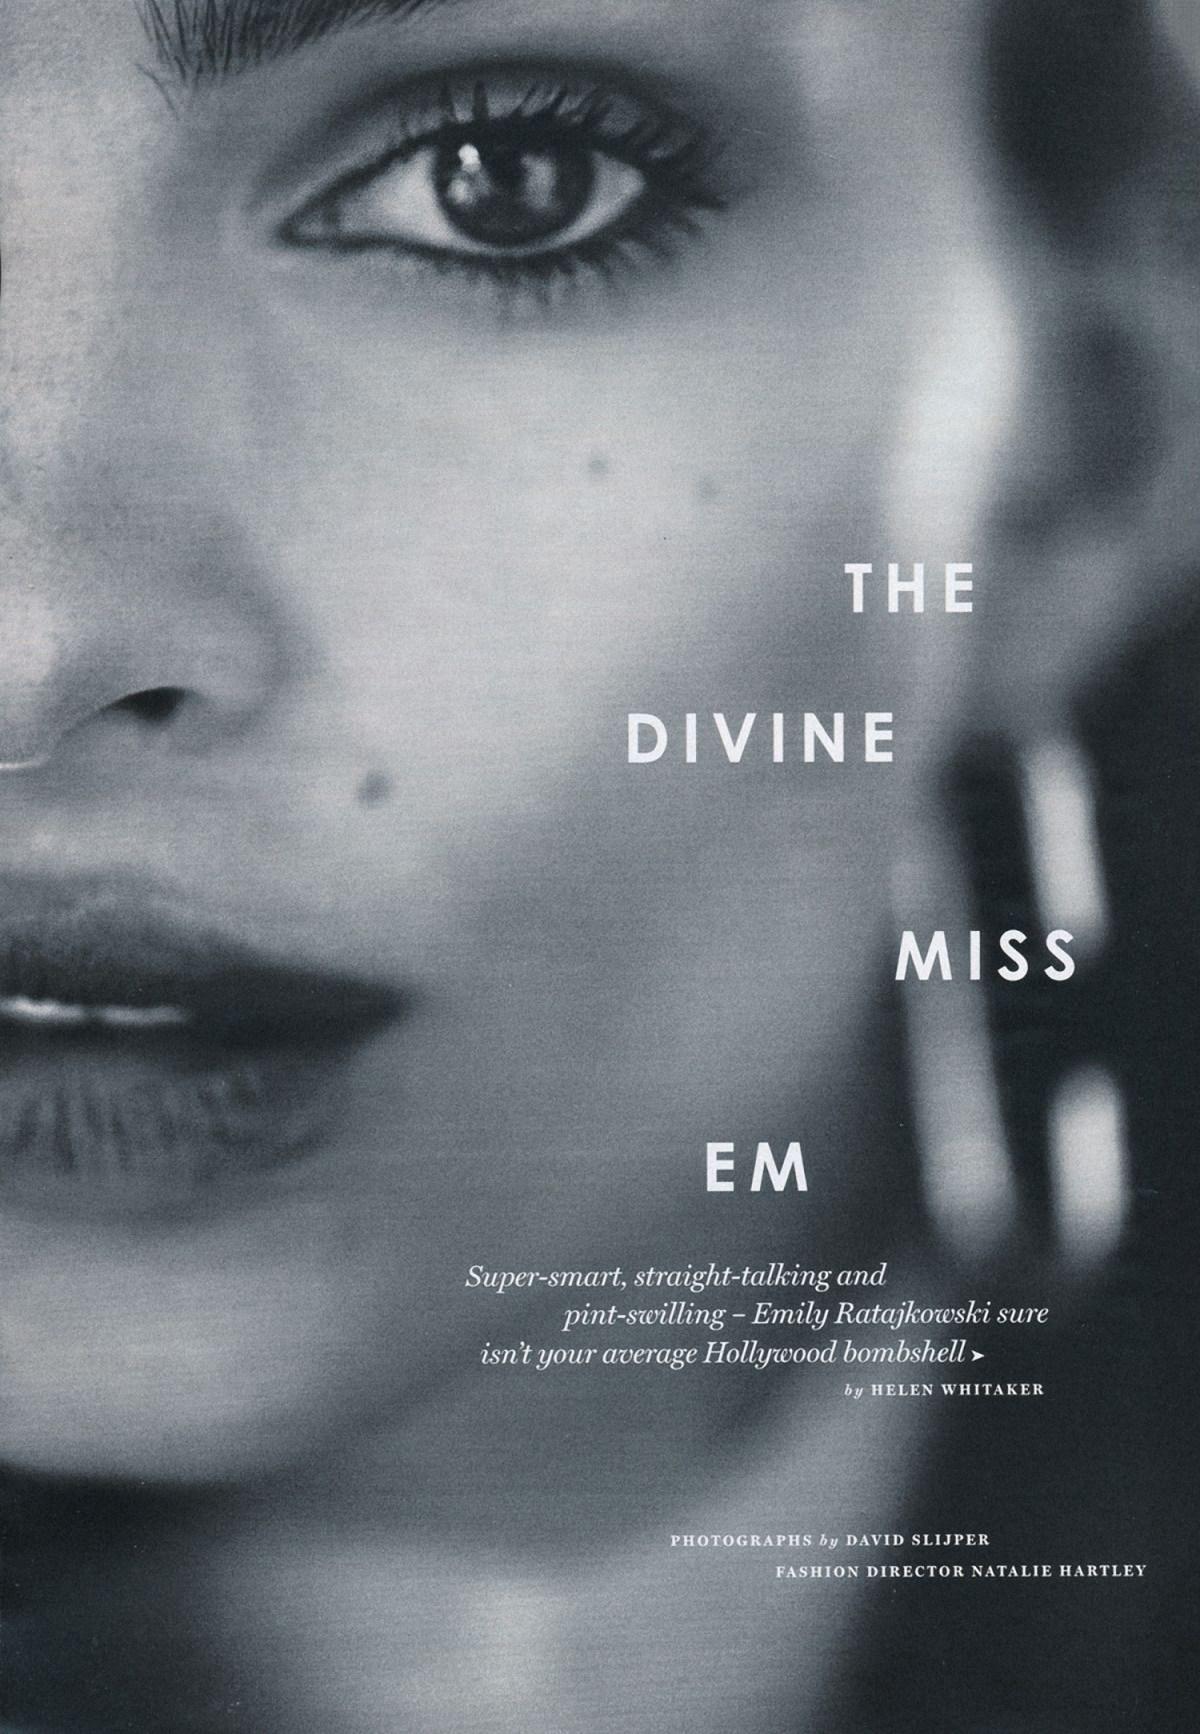 Emily Ratajkowski by David Slijper for Glamour UK